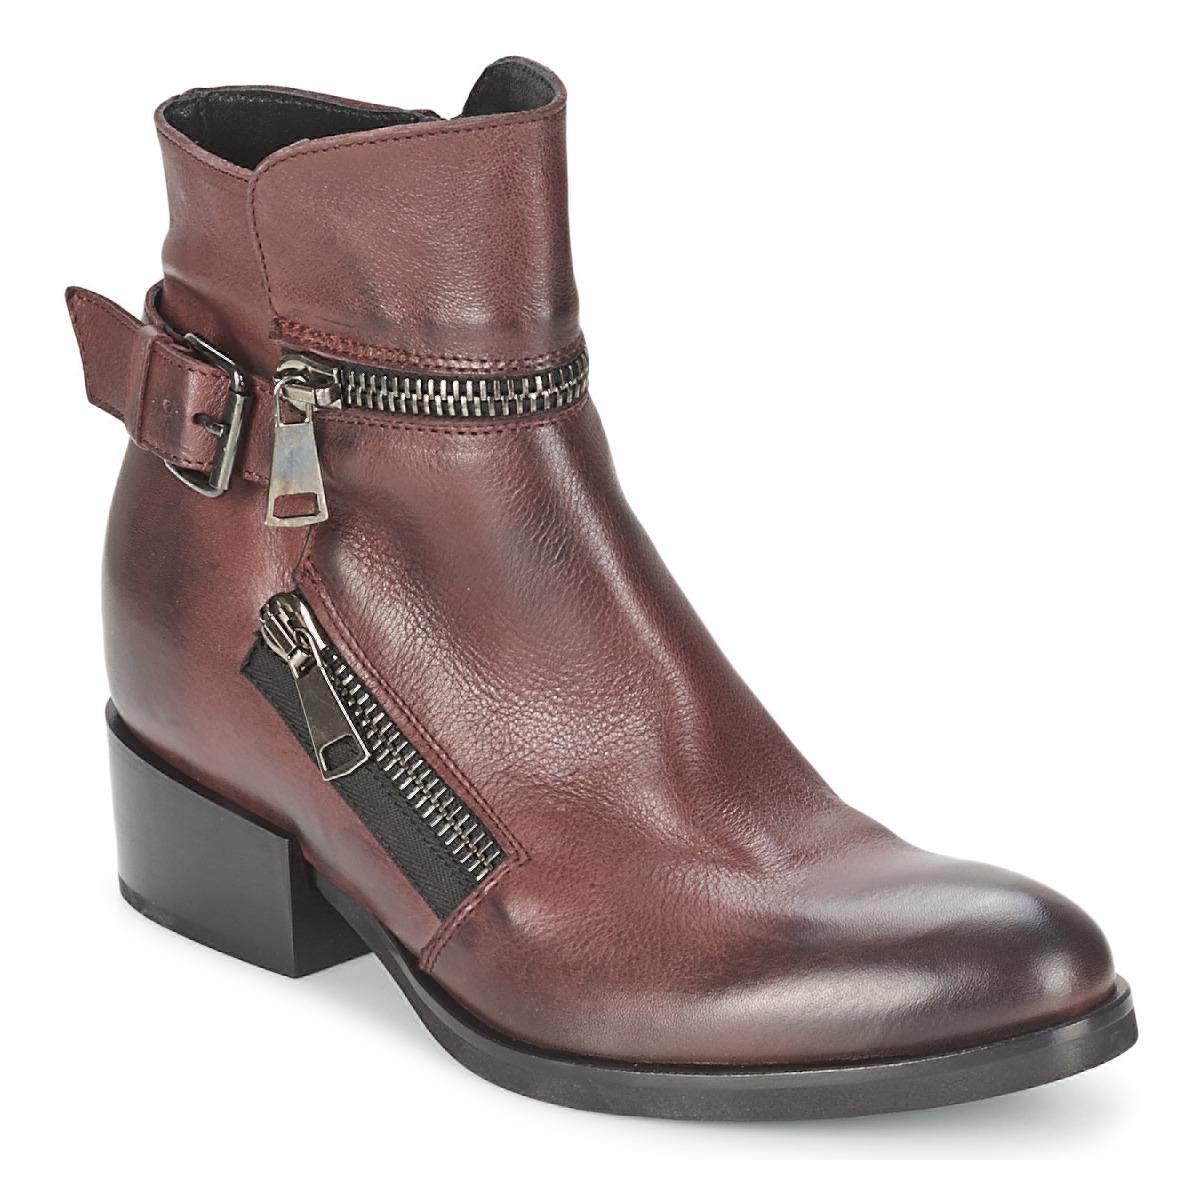 Strategia ZOOLI Bordeaux - Kostenloser Versand bei Spartoode ! - Schuhe Low Boots Damen 182,00 €